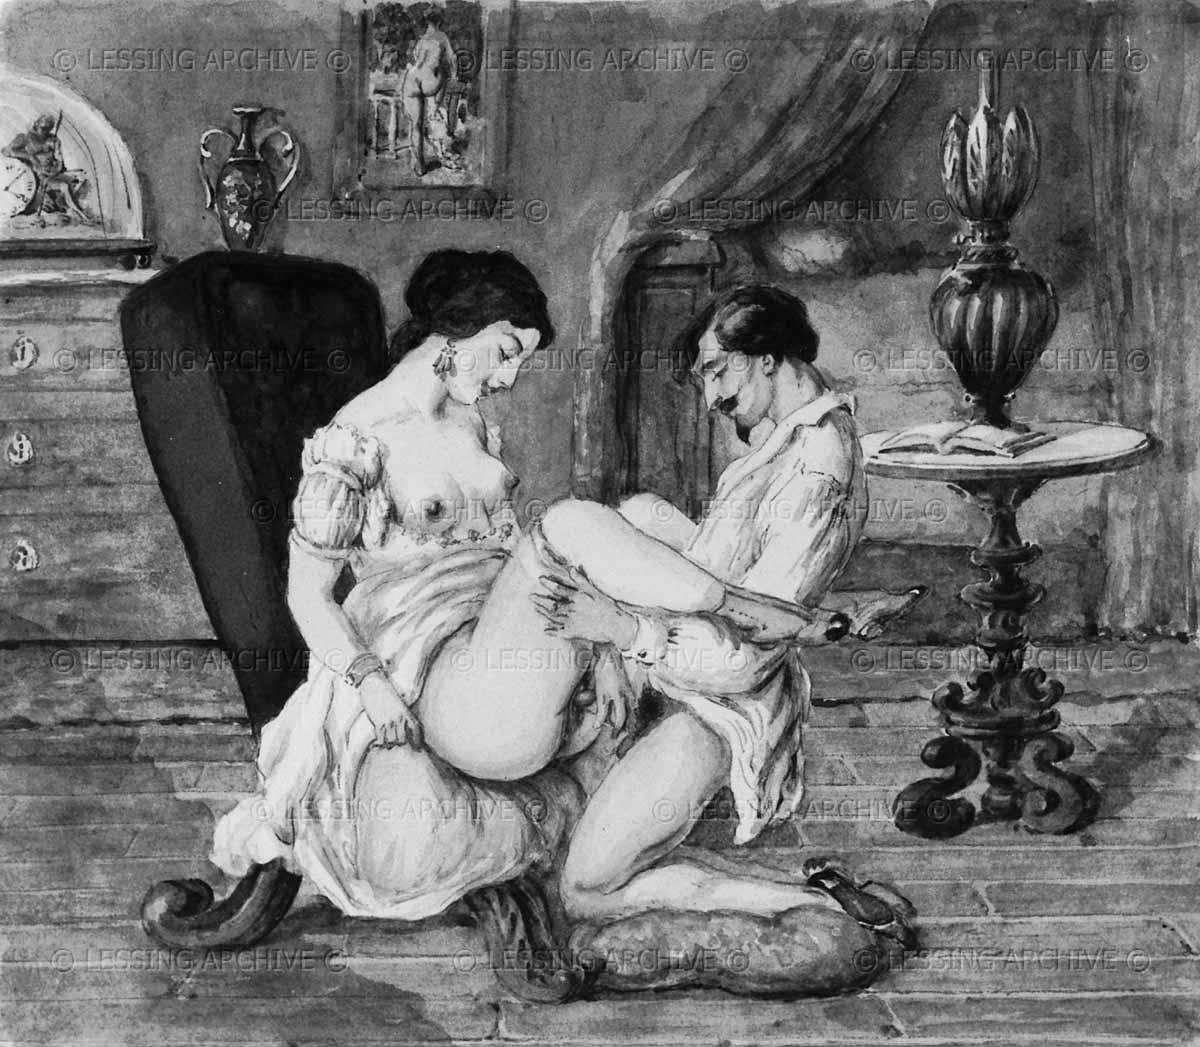 Секс рисунки 18 века 6 фотография